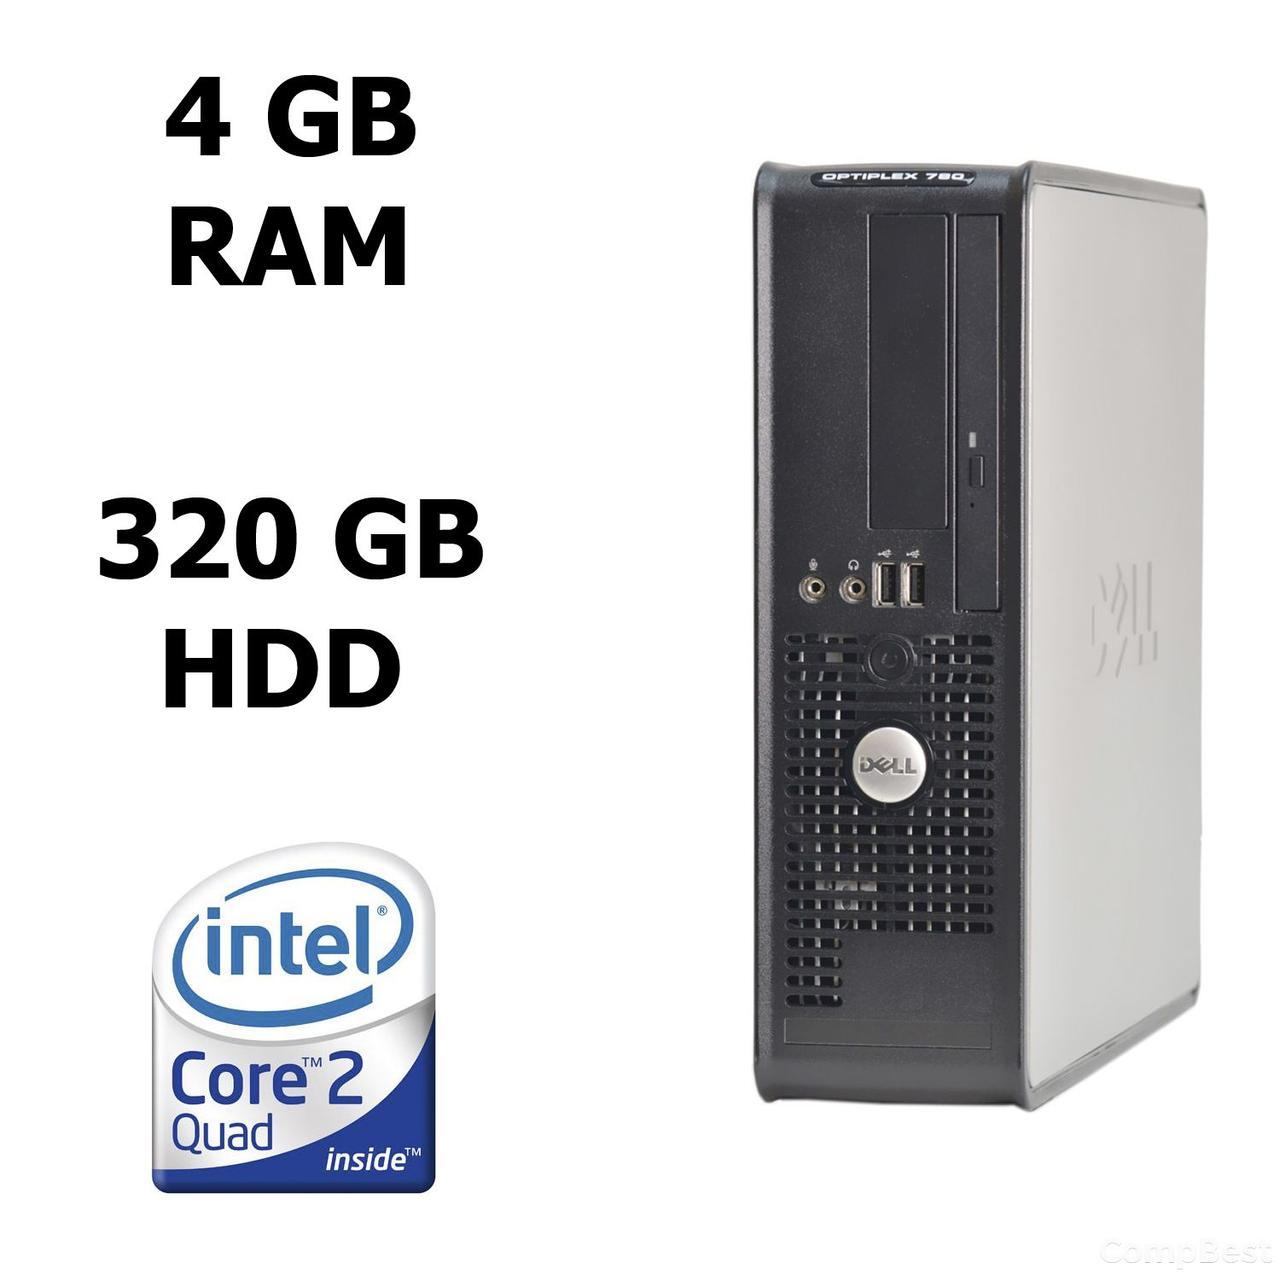 Dell Optiplex 780 SFF / Intel® Core™2 Quad Q8400 (4 ядра по 2.66 GHz) / 4 GB DDR3 / 320 GB HDD